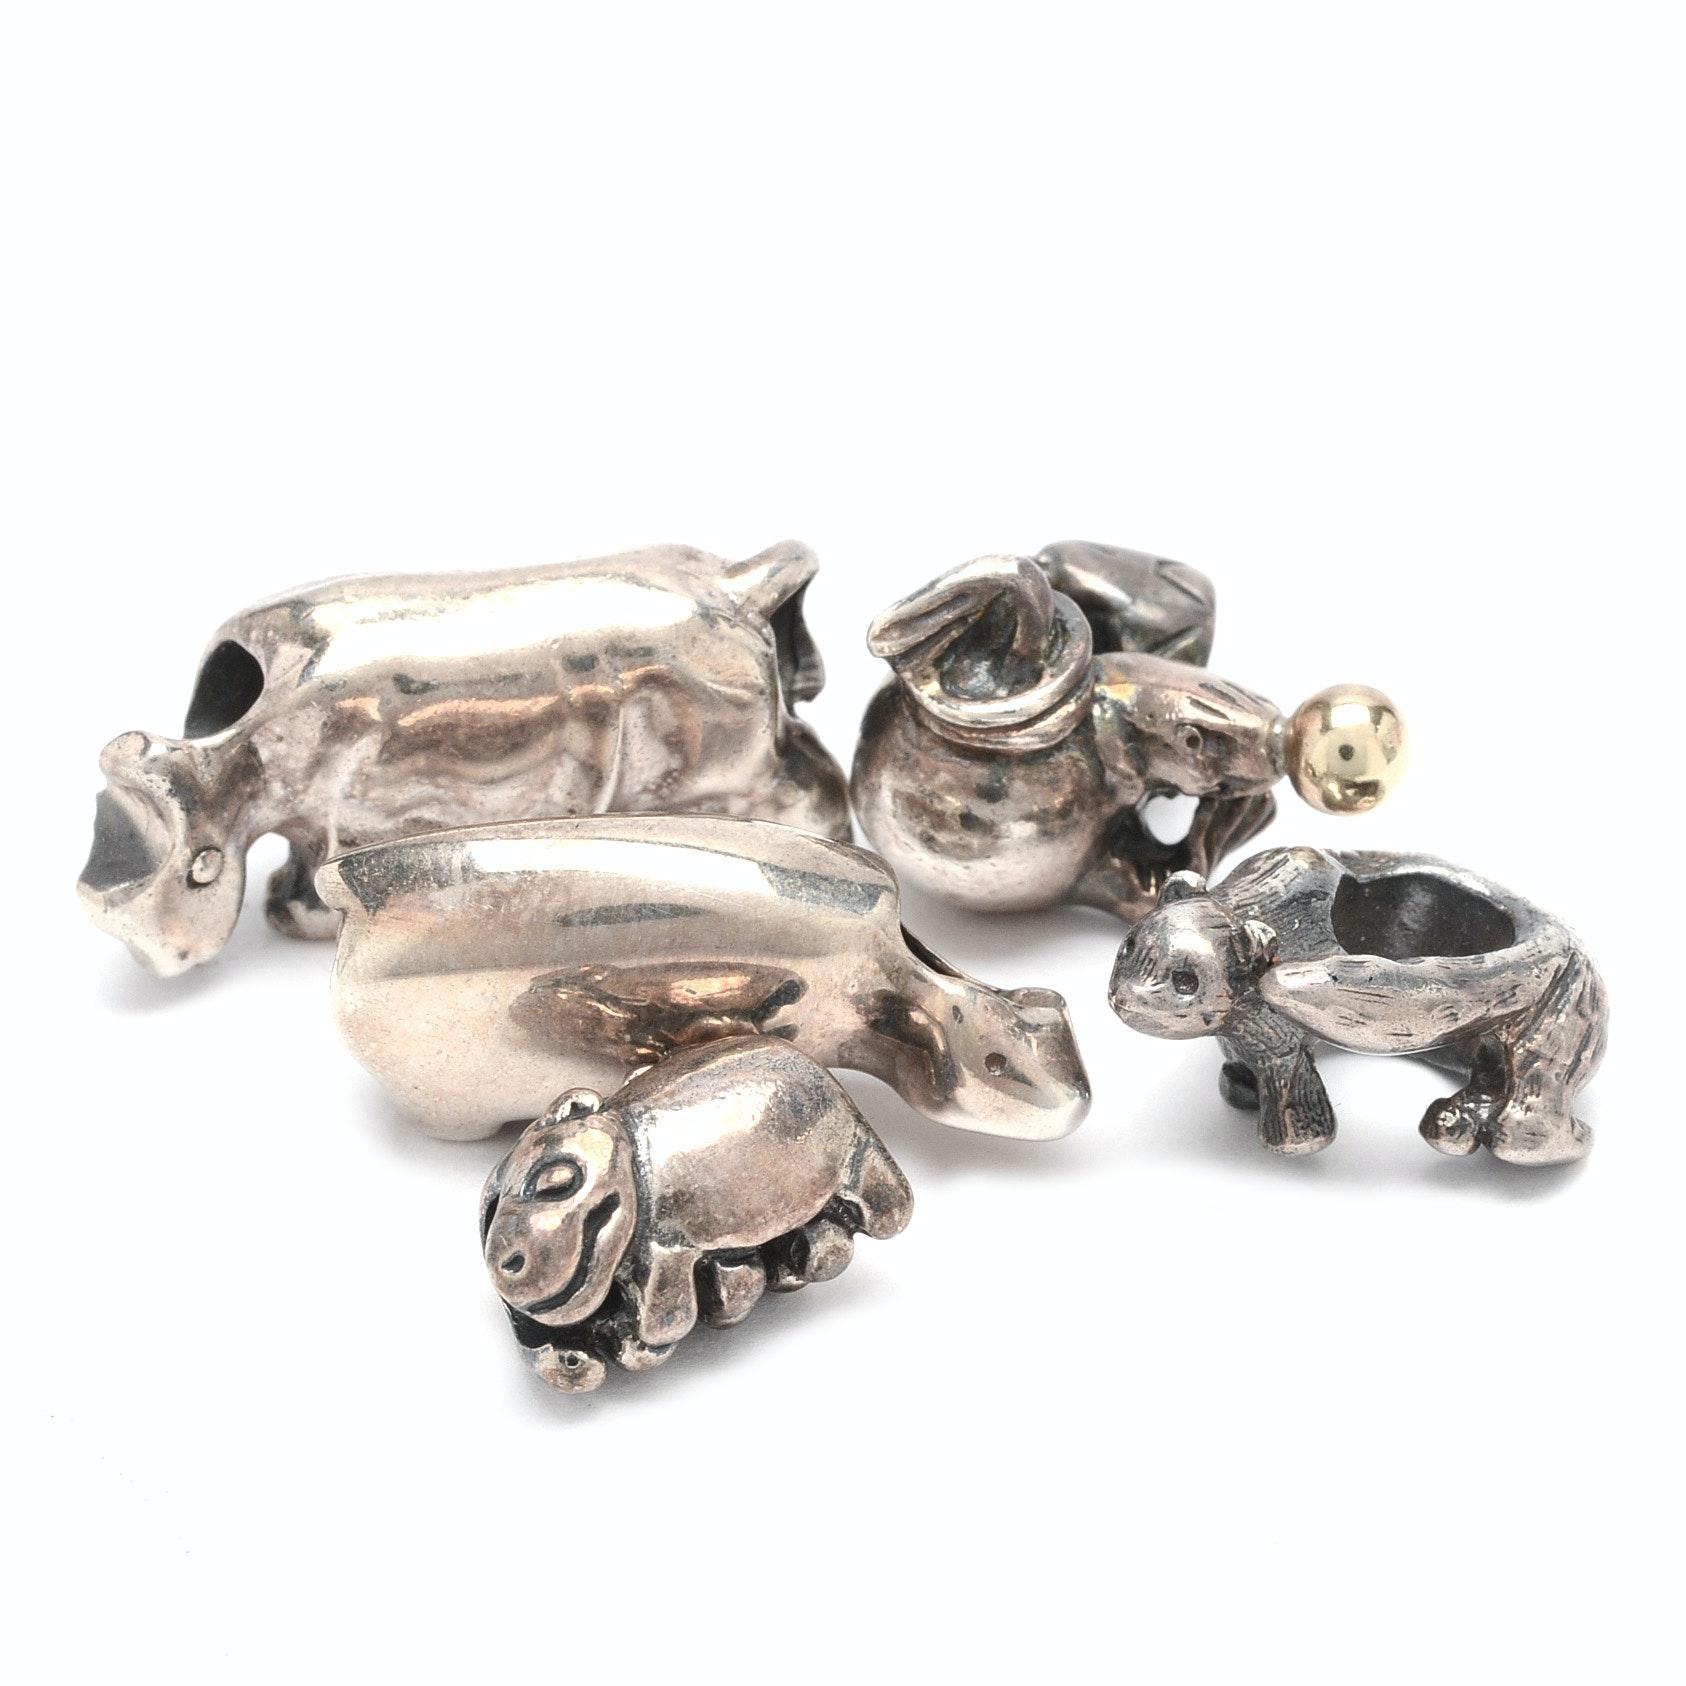 Trollbead Sterling Silver Animal Beads